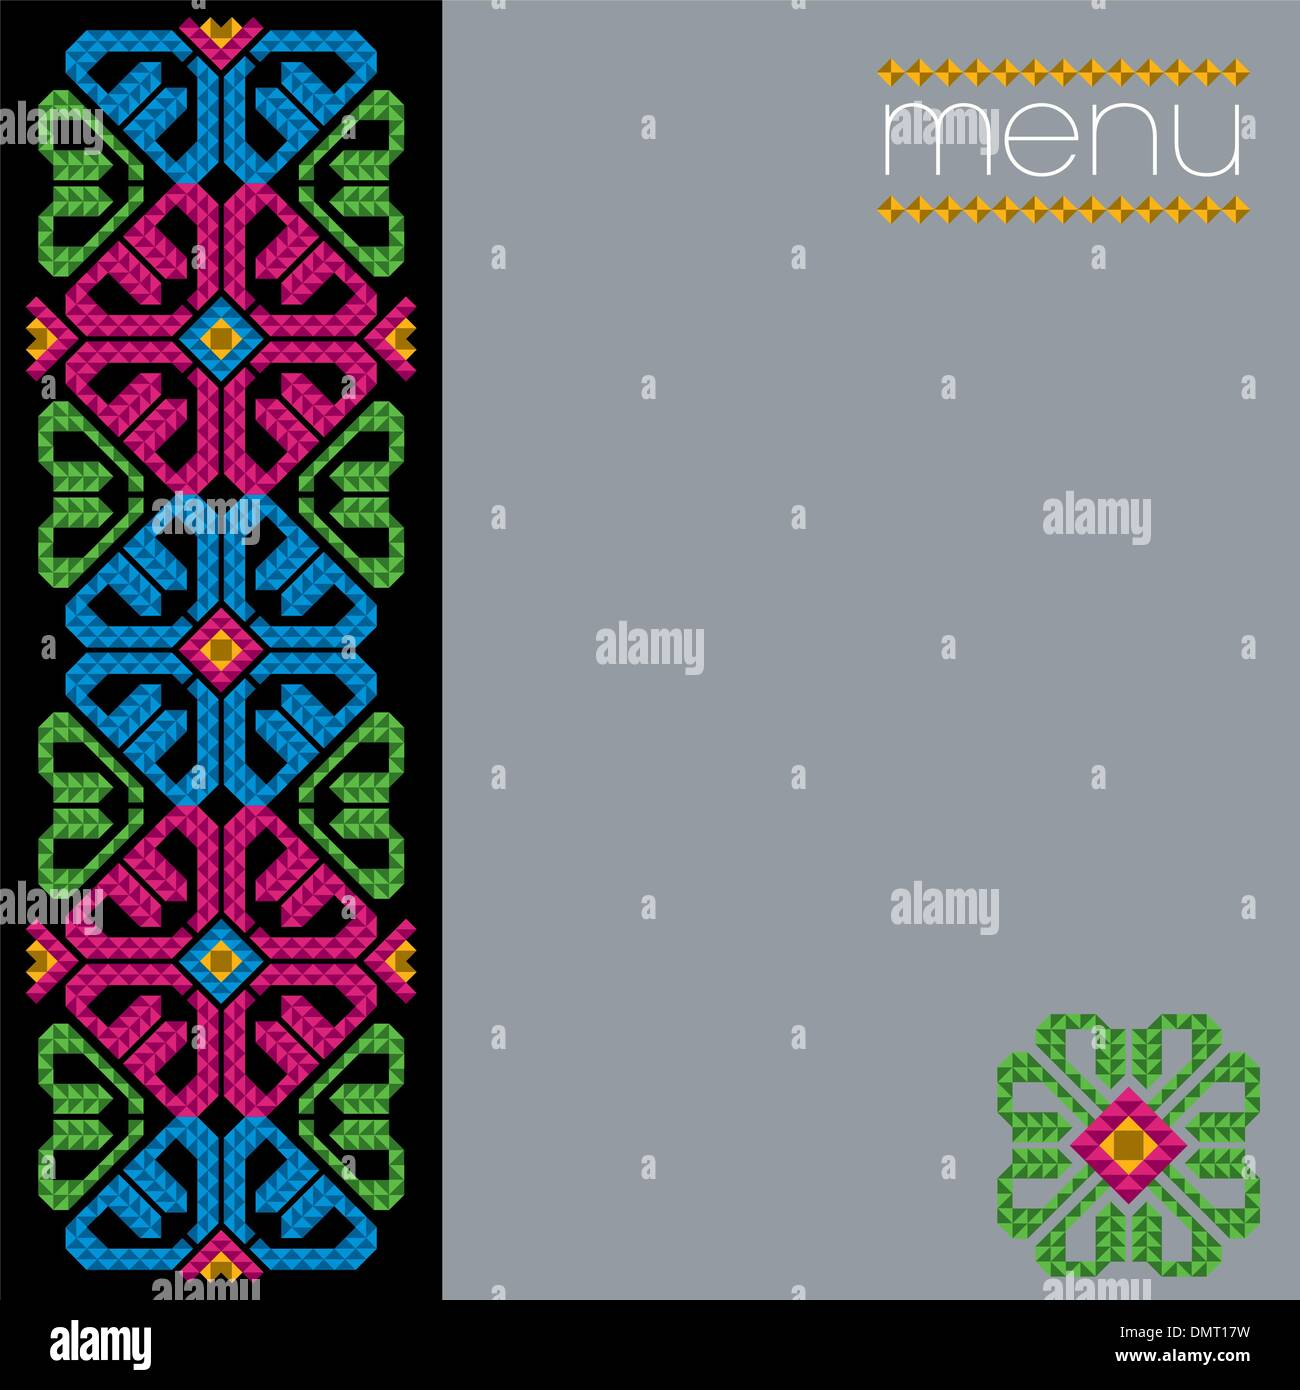 mexican restaurant menu cover design stock vector art & illustration